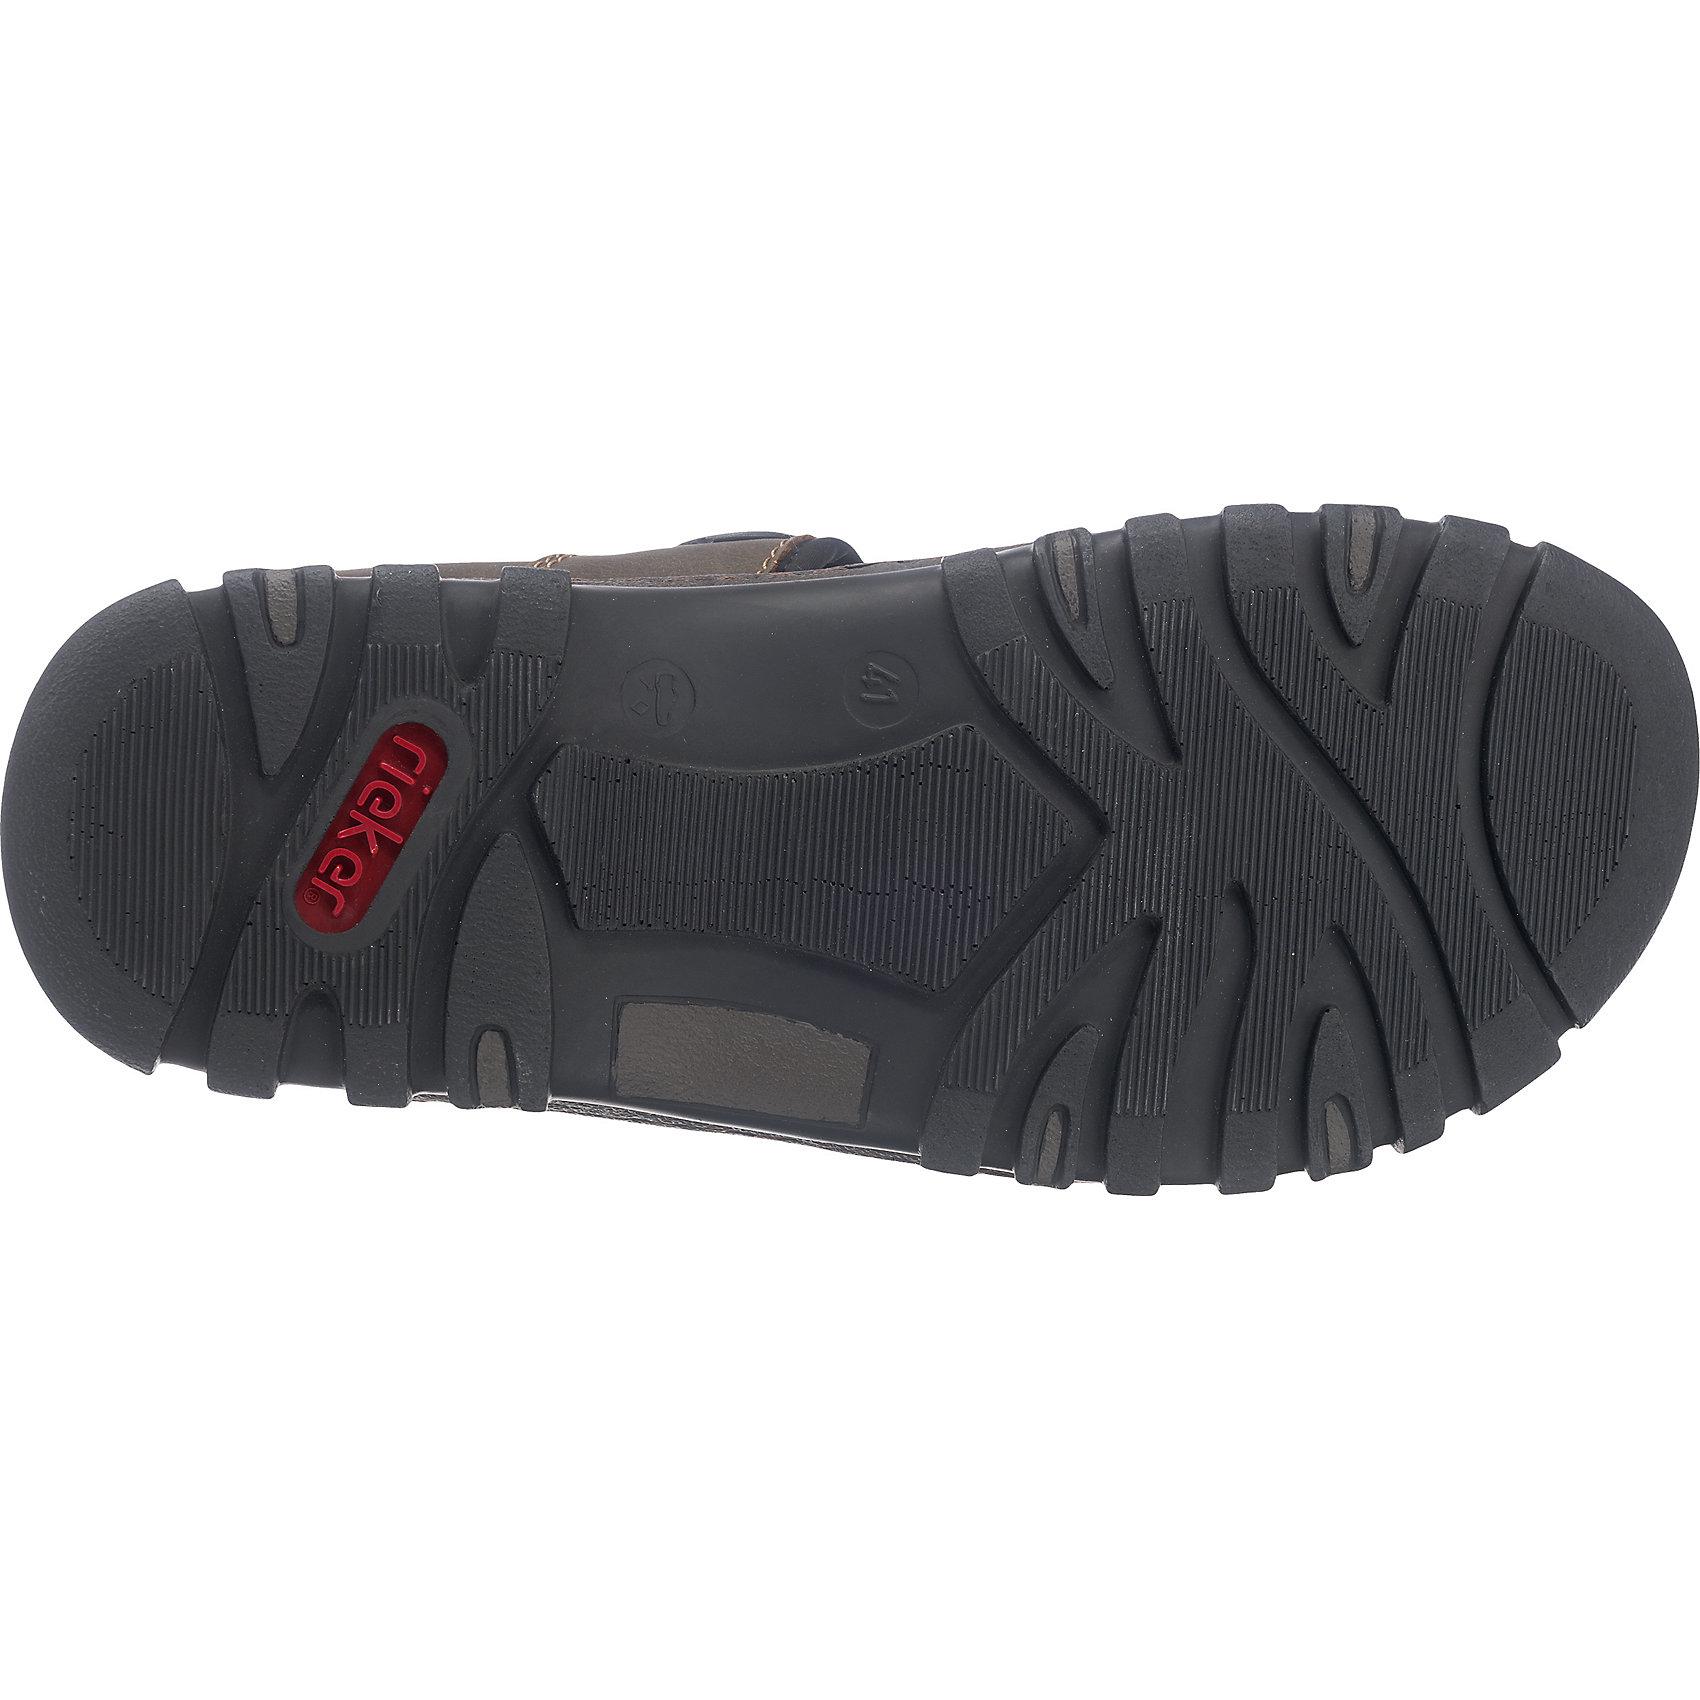 neu rieker sandalen braun kombi schwarz modell 1 5715064 ebay. Black Bedroom Furniture Sets. Home Design Ideas